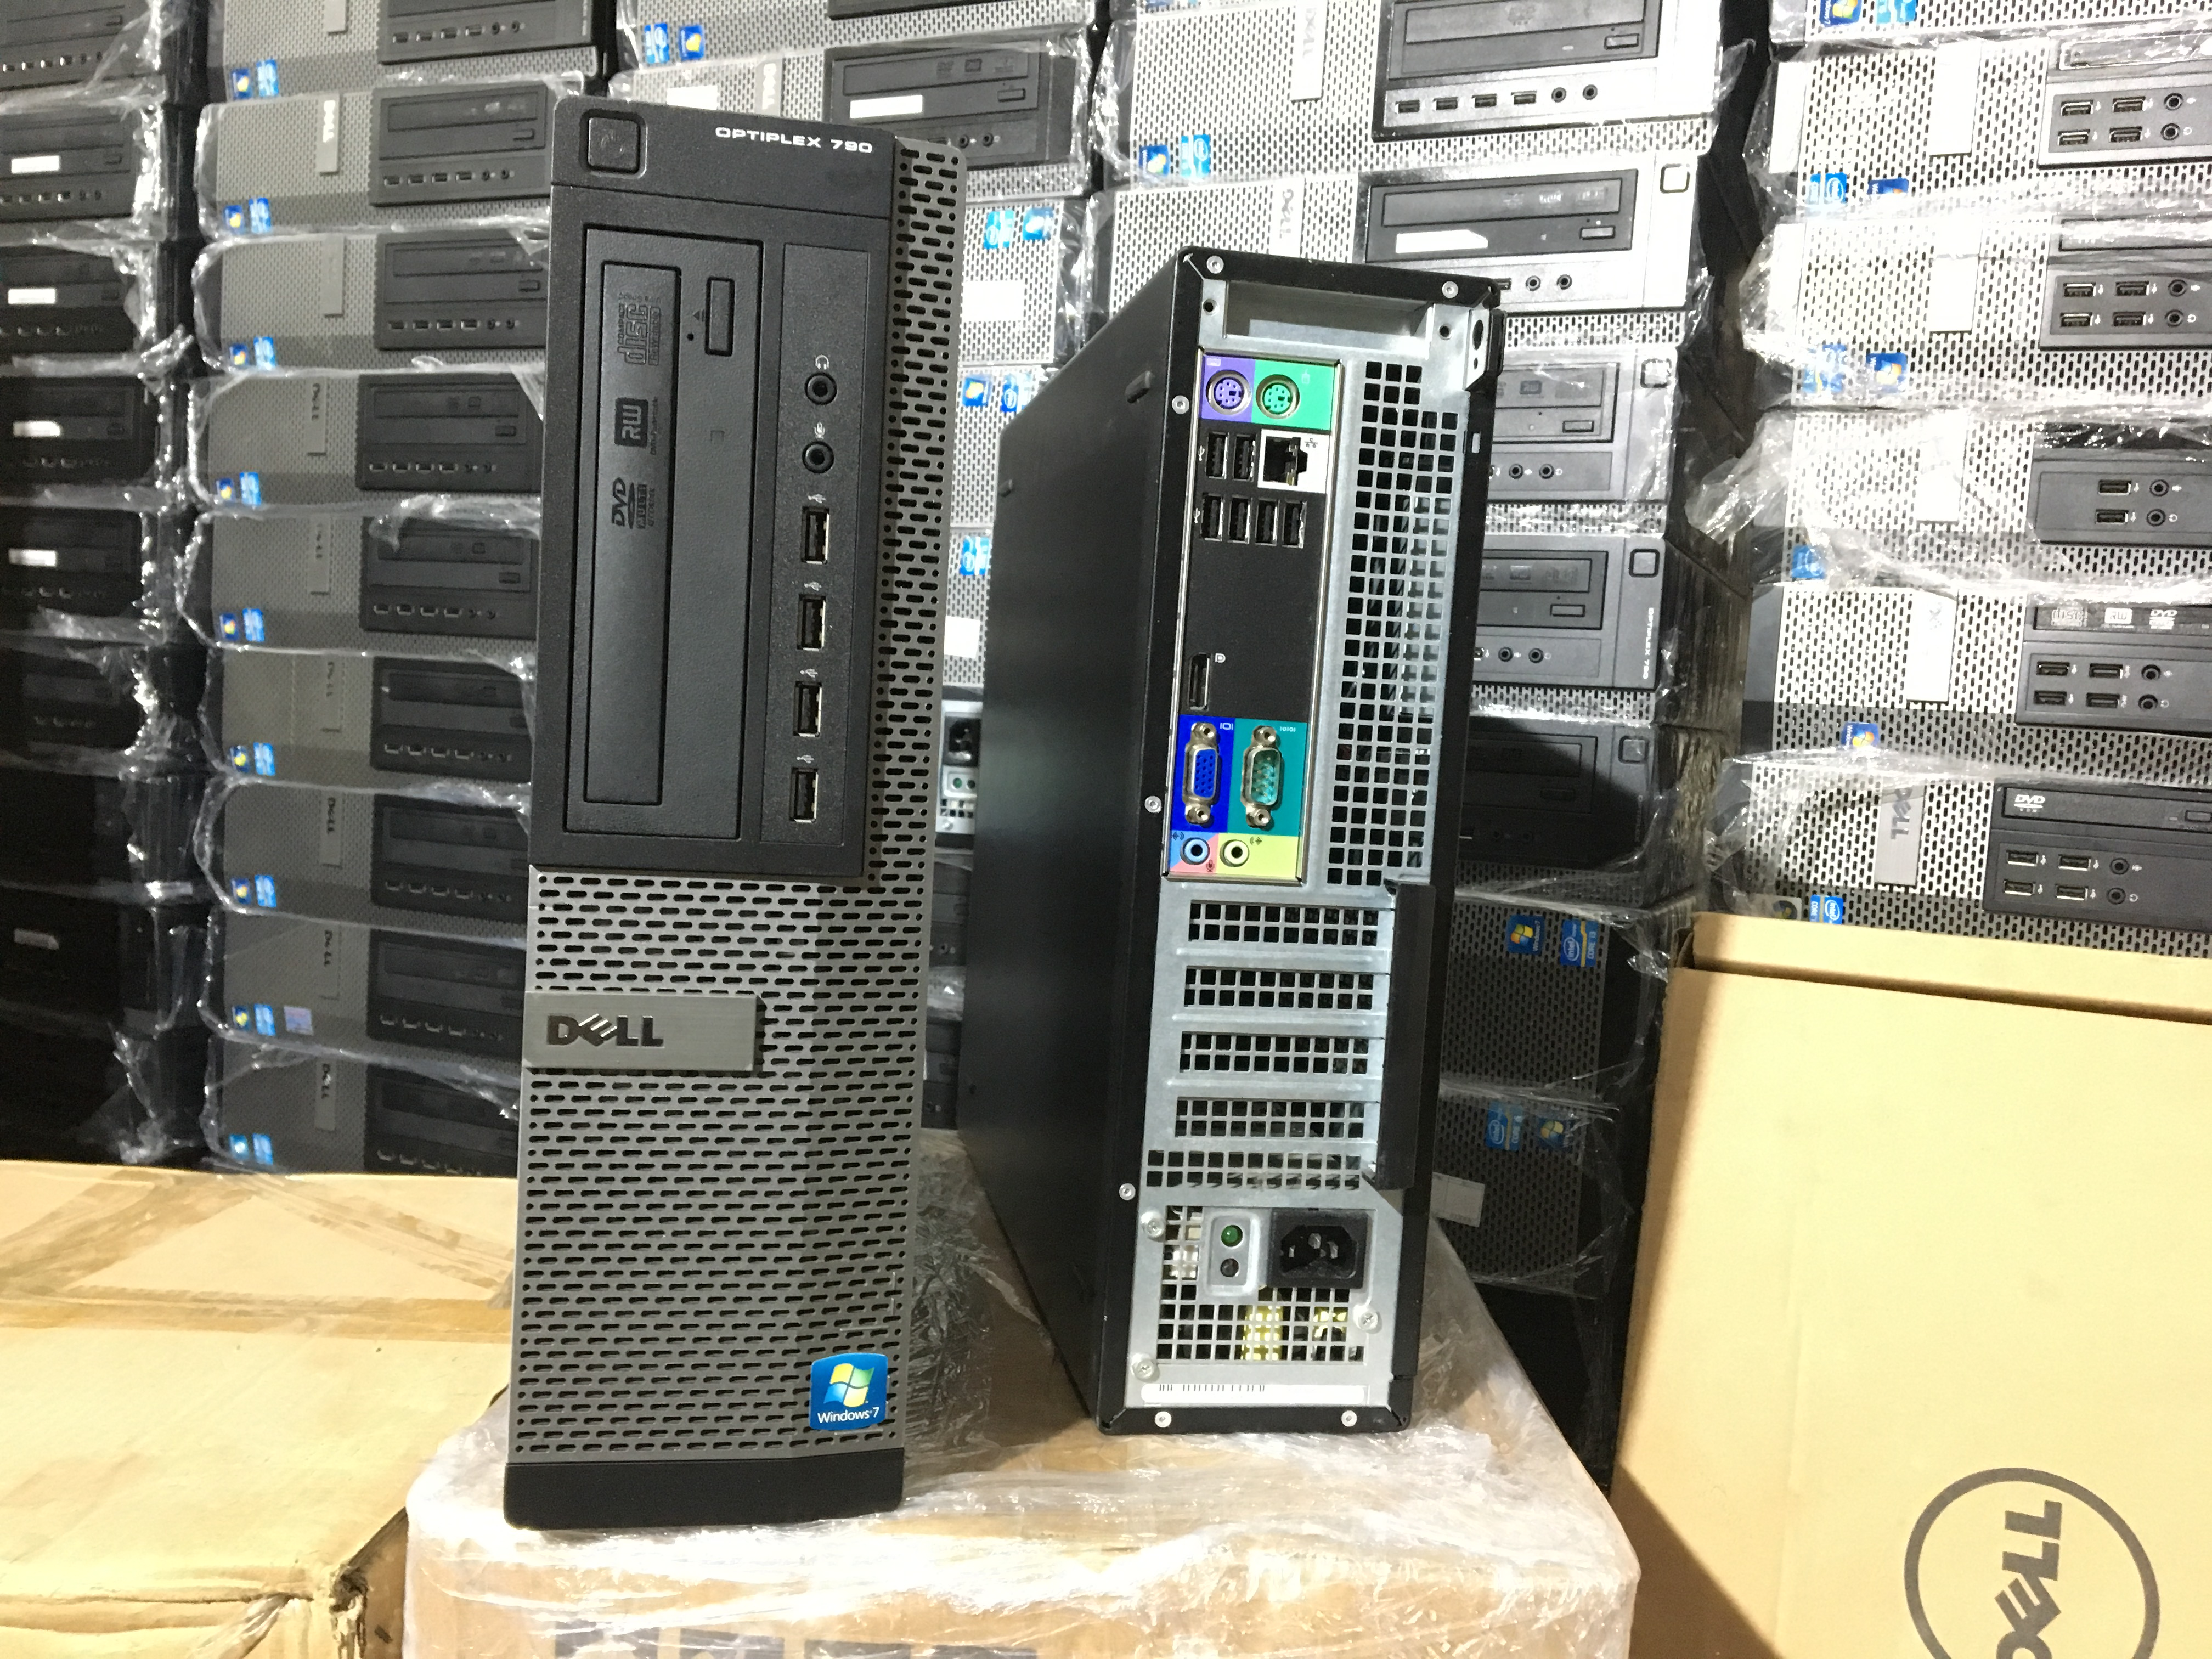 http://maytinhrenhat.vn/Images/image/Dell%20790%20DT/IMG_0192.JPG